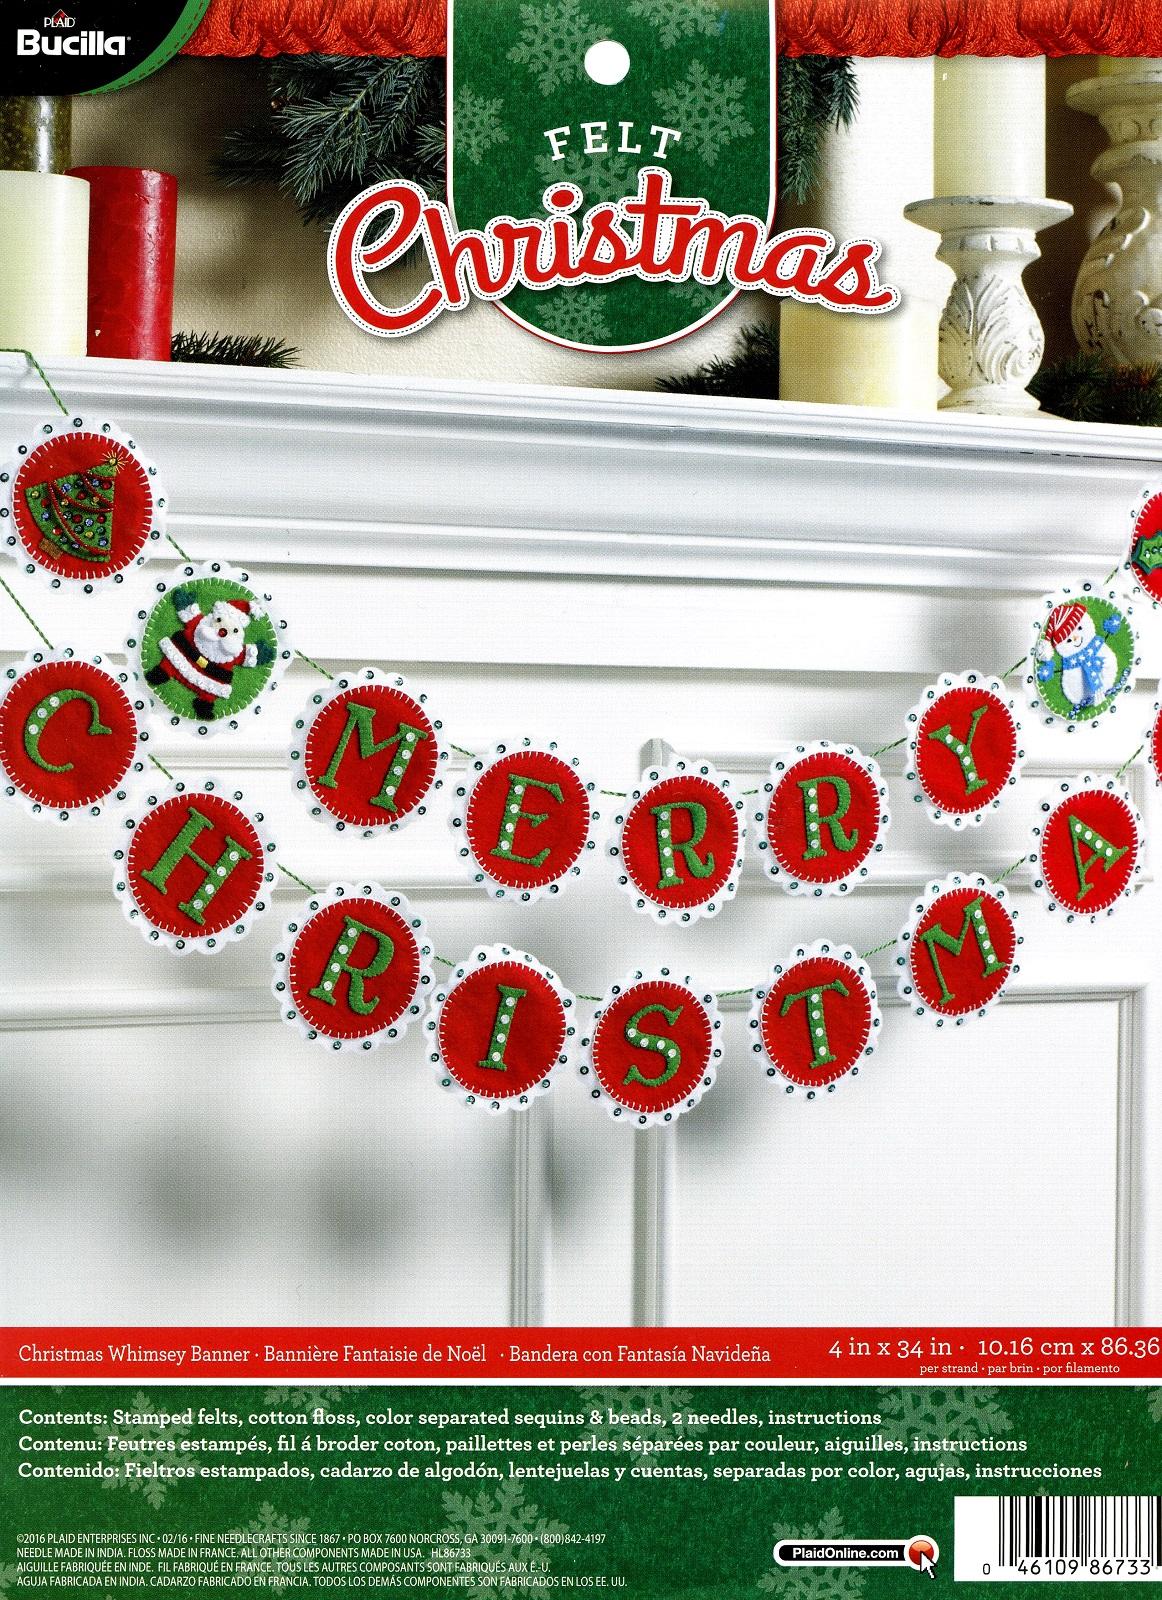 12 Days Of Christmas Bucilla Felt Ornament Kit 86066